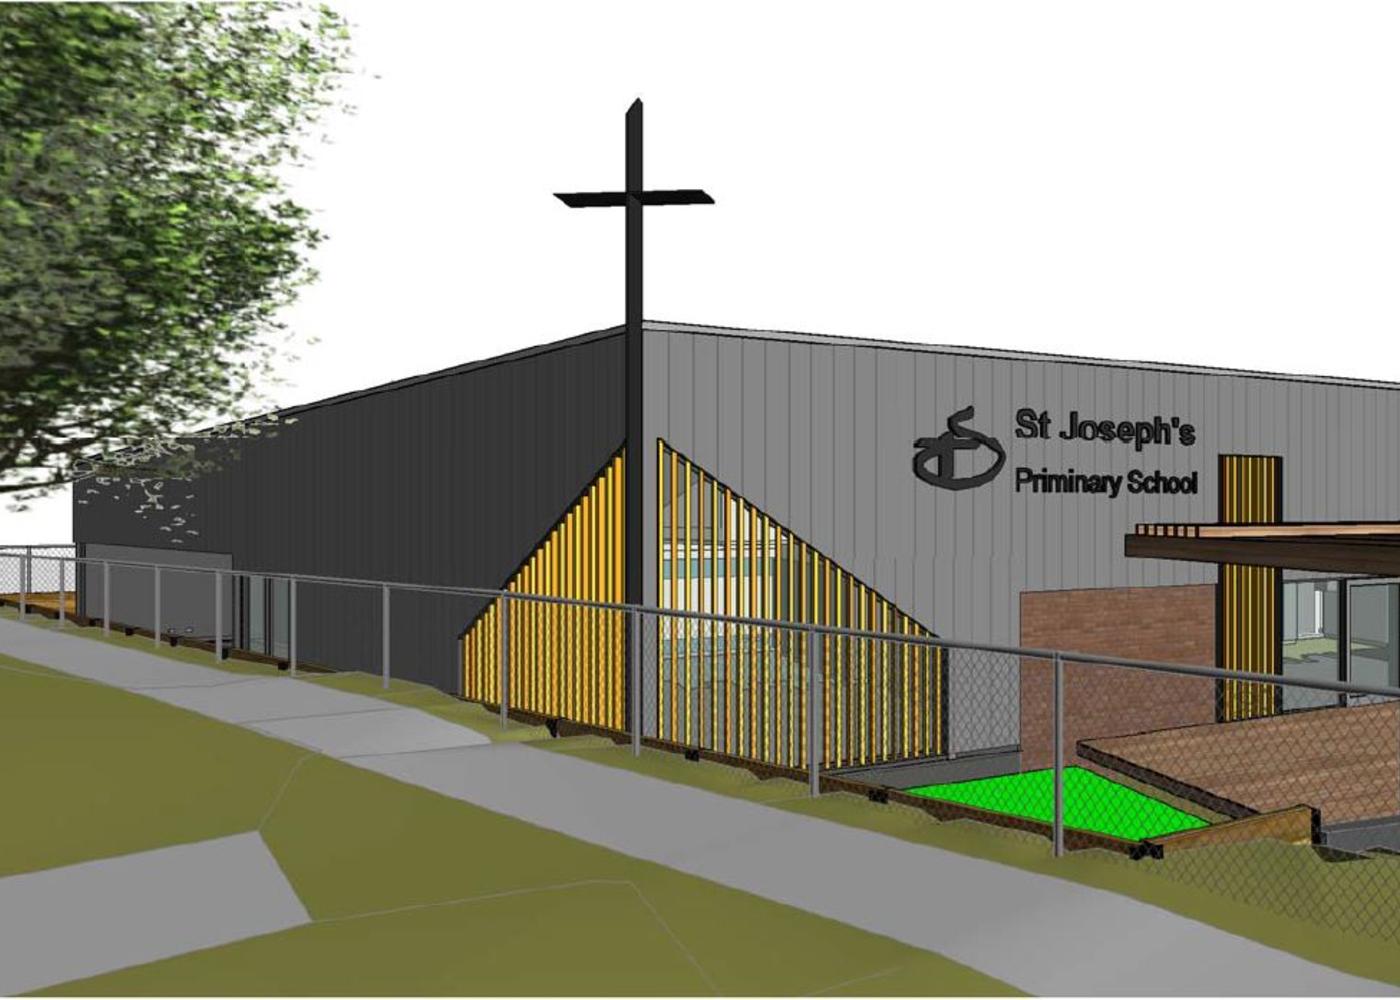 1-Bridge-Street-Korumburra-St-Josephs-Primary-school-Crosier-Scott-1.jpg